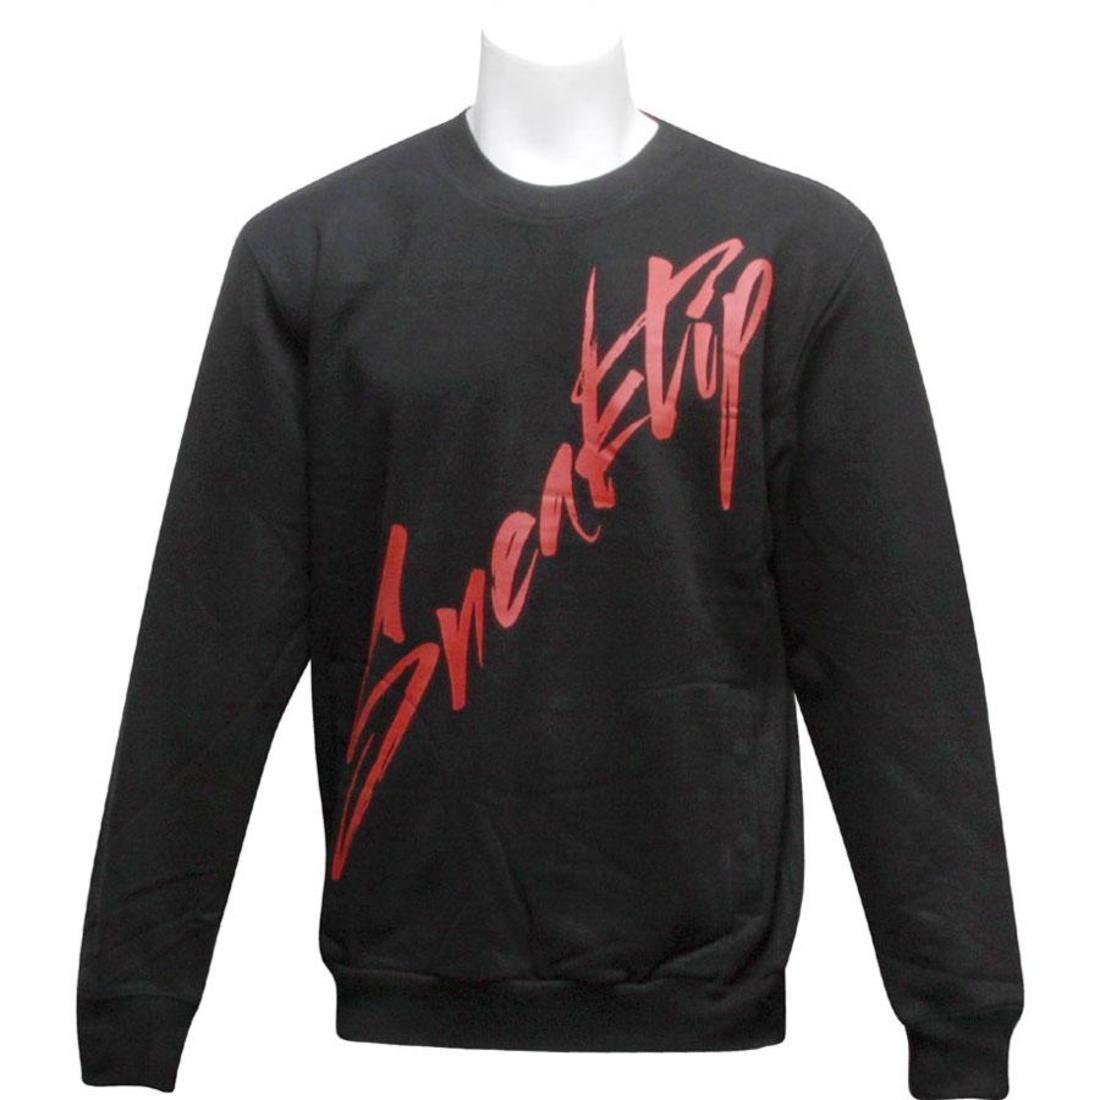 SNEAKTIP スニークティップ ロゴ 黒 ブラック 【 BLACK SNEAKTIP HAND WRITE LOGO CREW NECK 】 メンズファッション トップス スウェット トレーナー